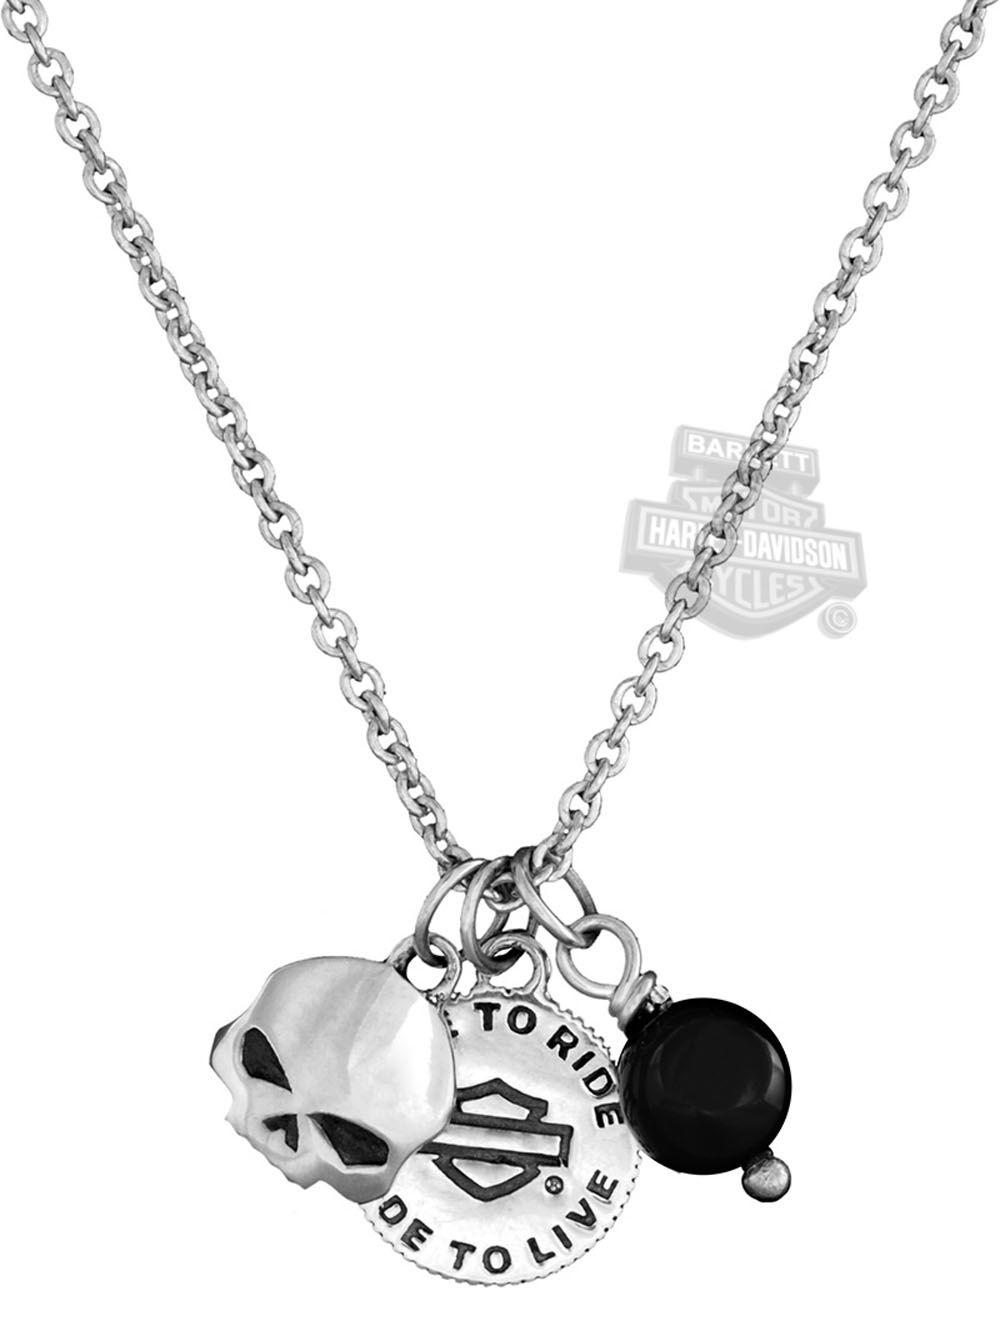 harley davidson wedding bands Harley Davidson Womens Silver Wild Child Mini Charms Necklace by Mod Jewelry Barnett Harley Davidson Biker